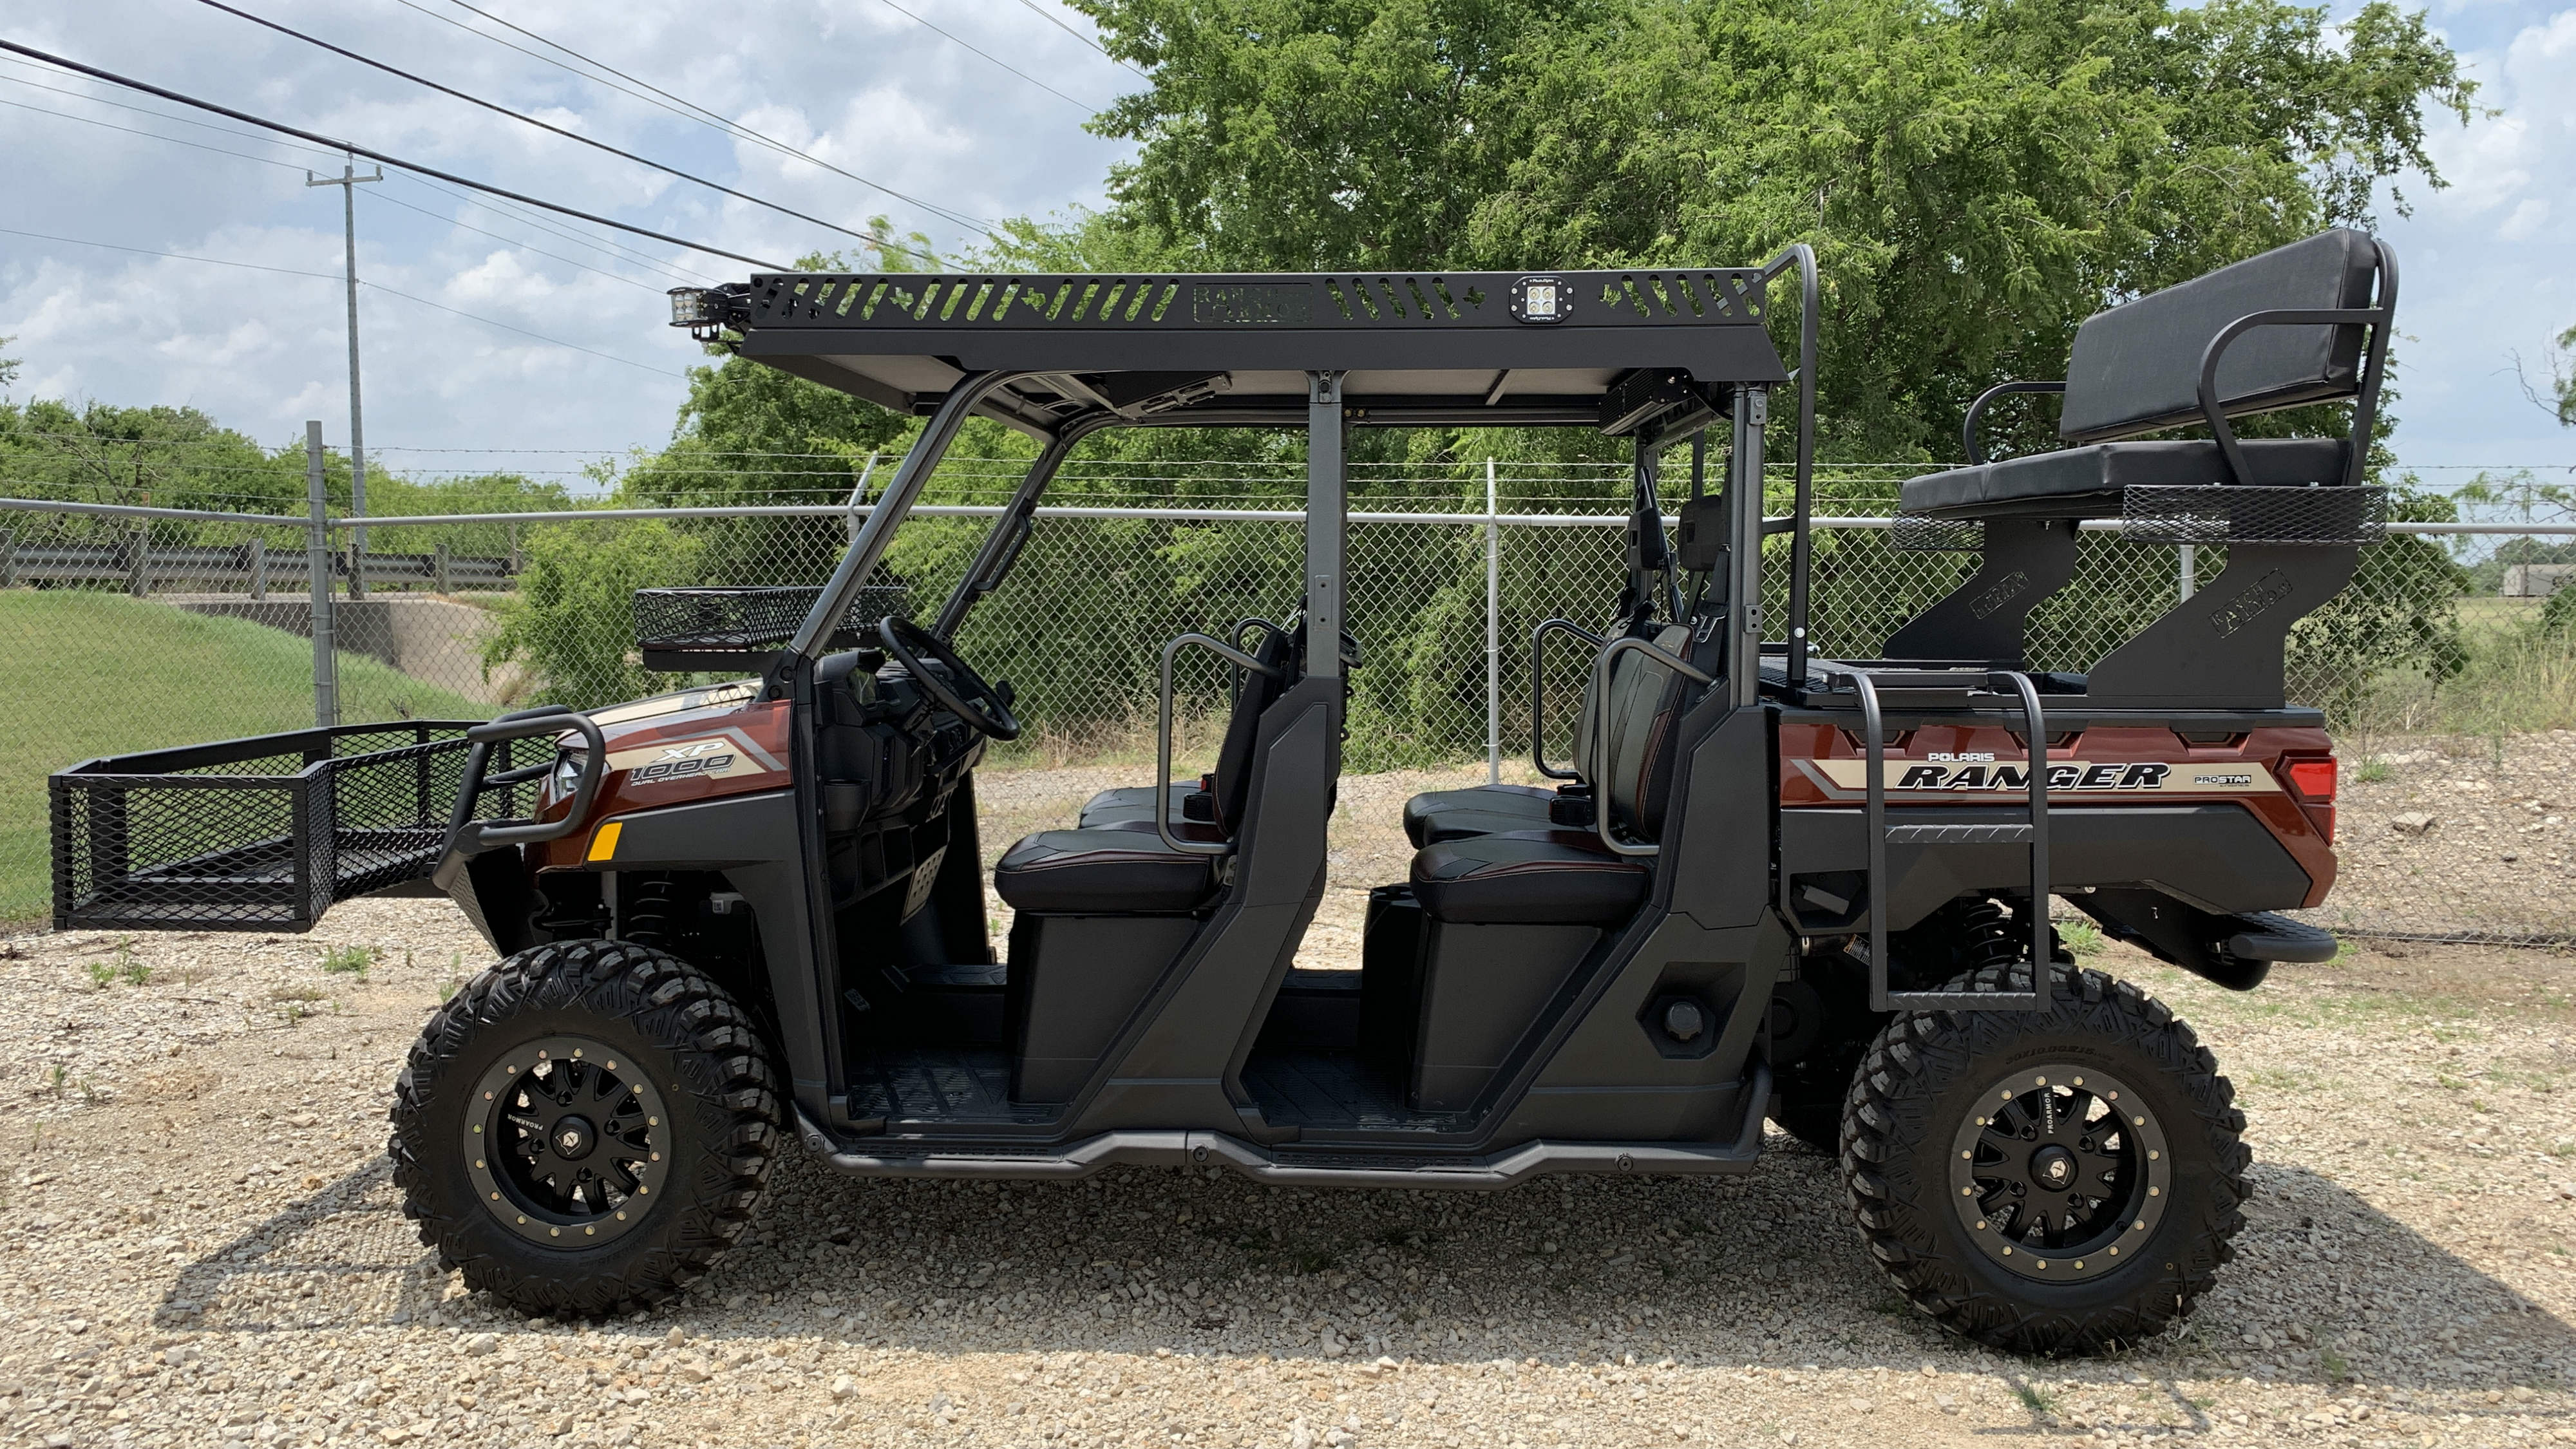 2019-polaris-ranger-1000-crew-metal-roof-texas-outdoors-utv-outfit-with-ranch-armor.jpg